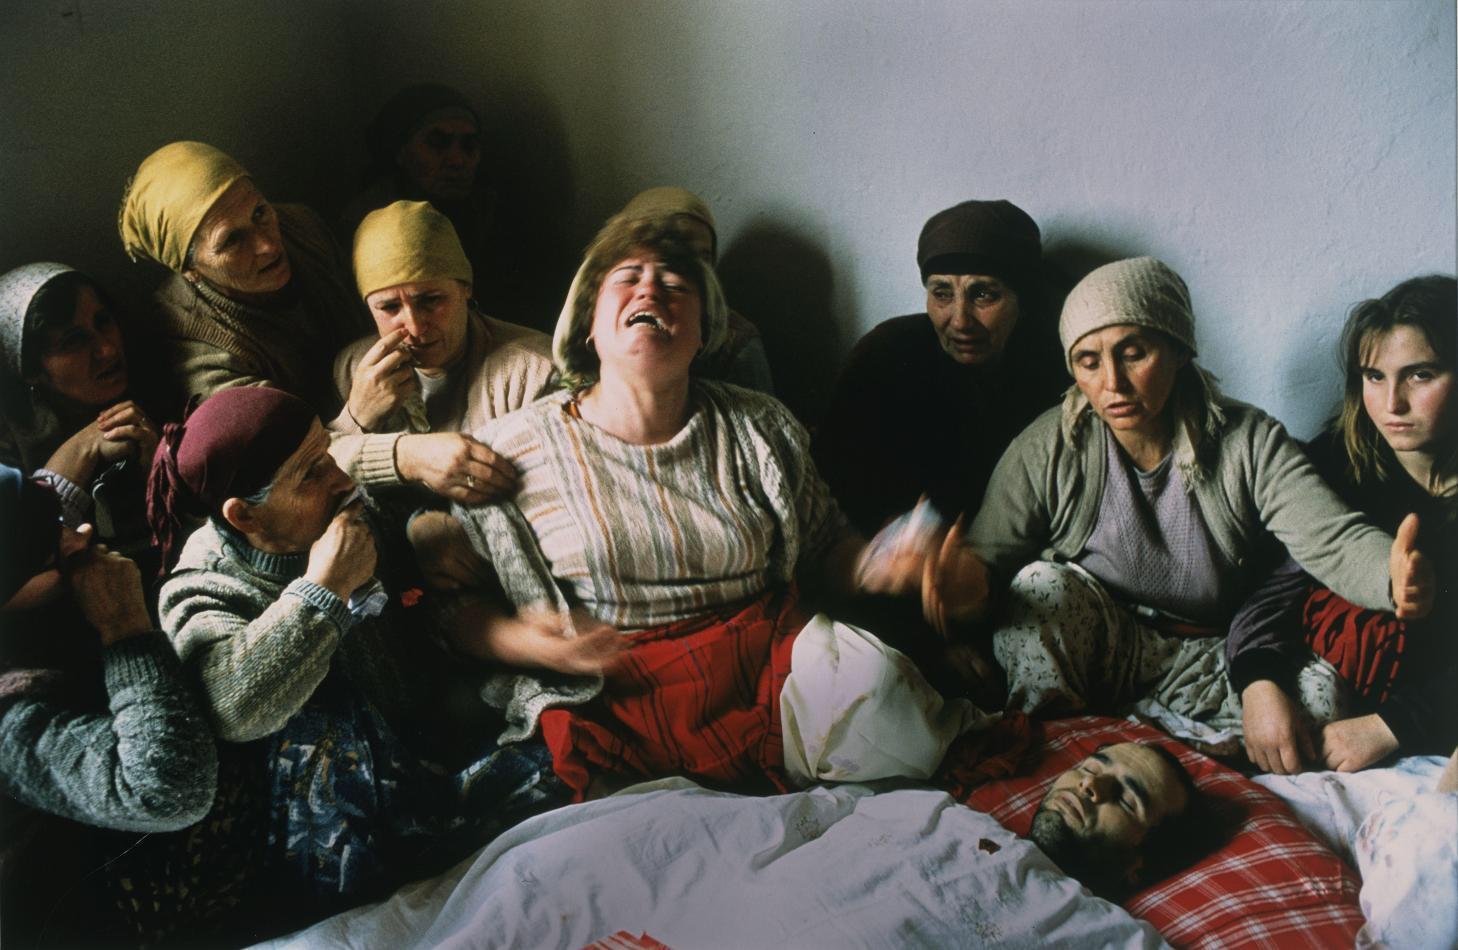 istorijski fragmenti Accidental-renessaince-photos-7c